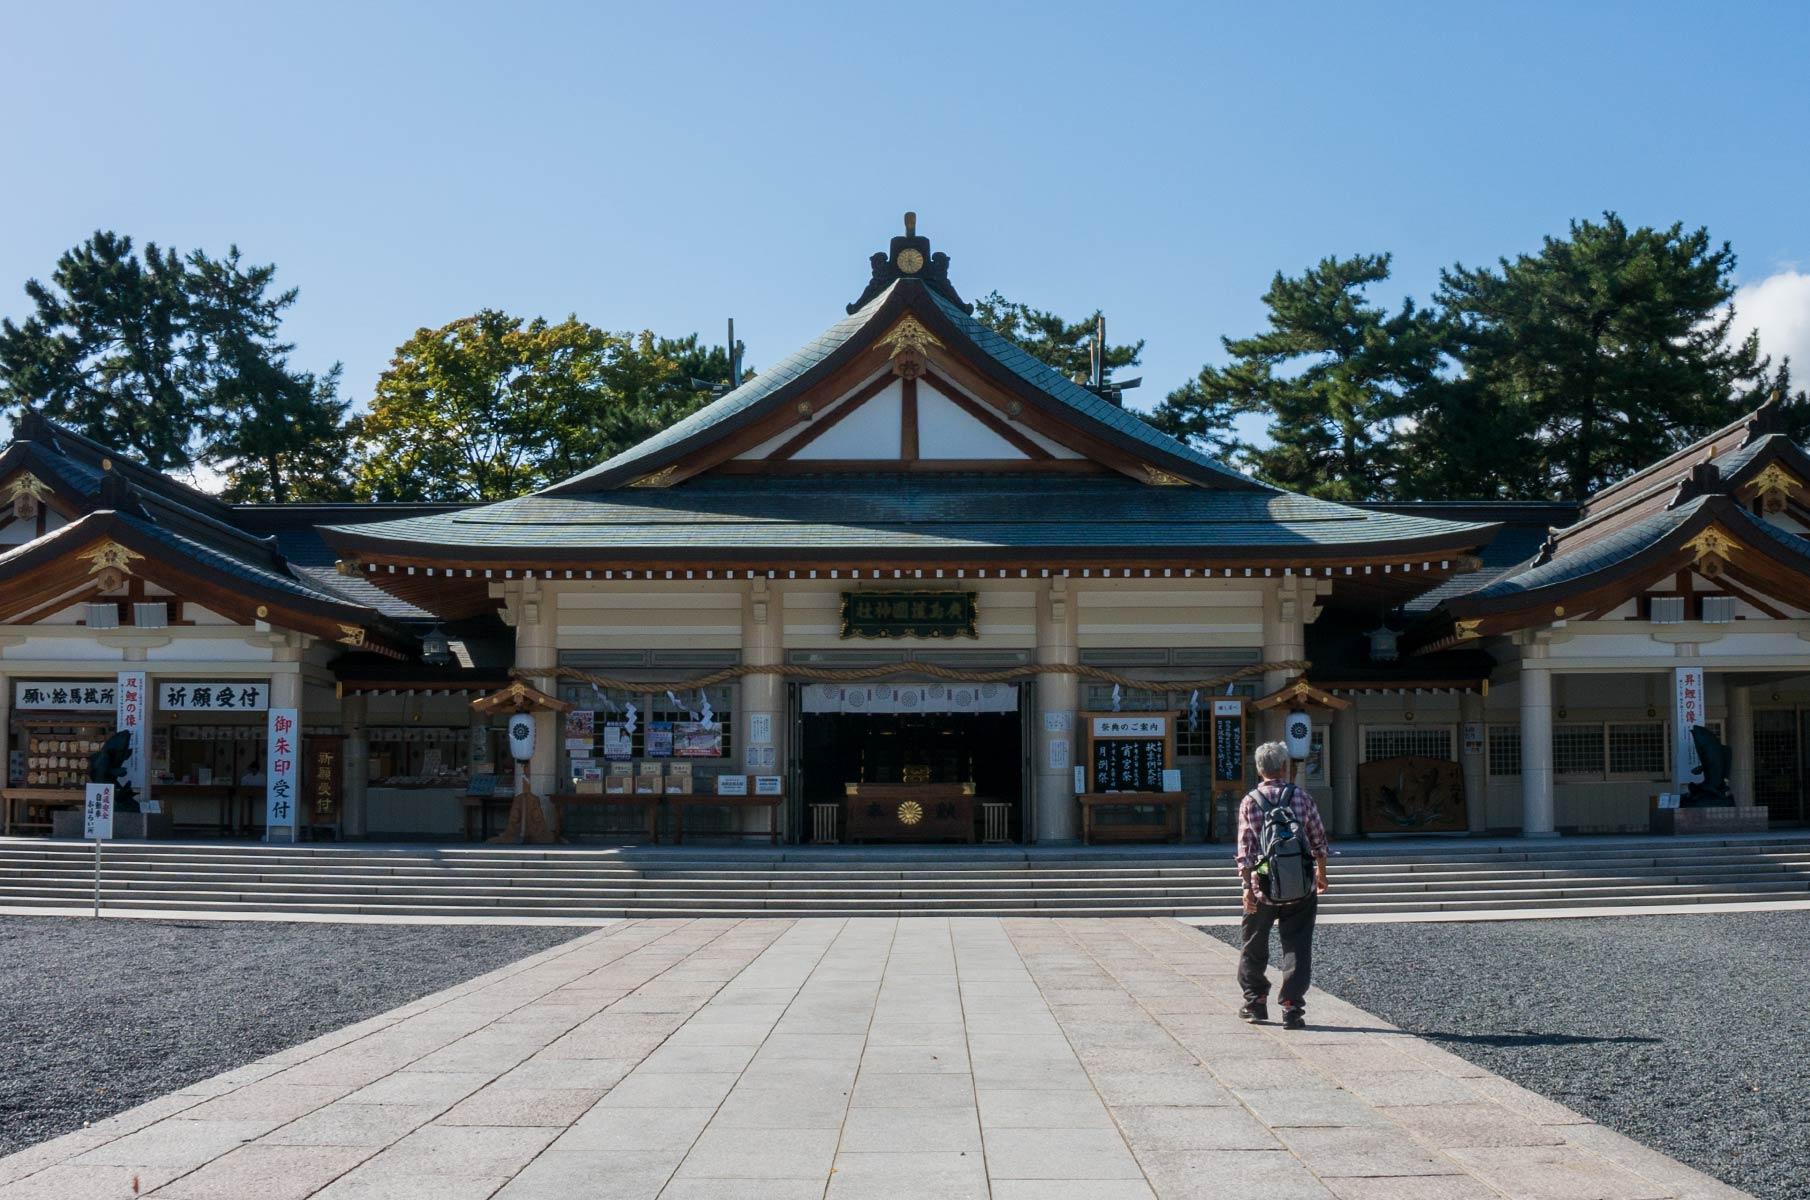 Hiroshima Gokoku Schrein in Japan